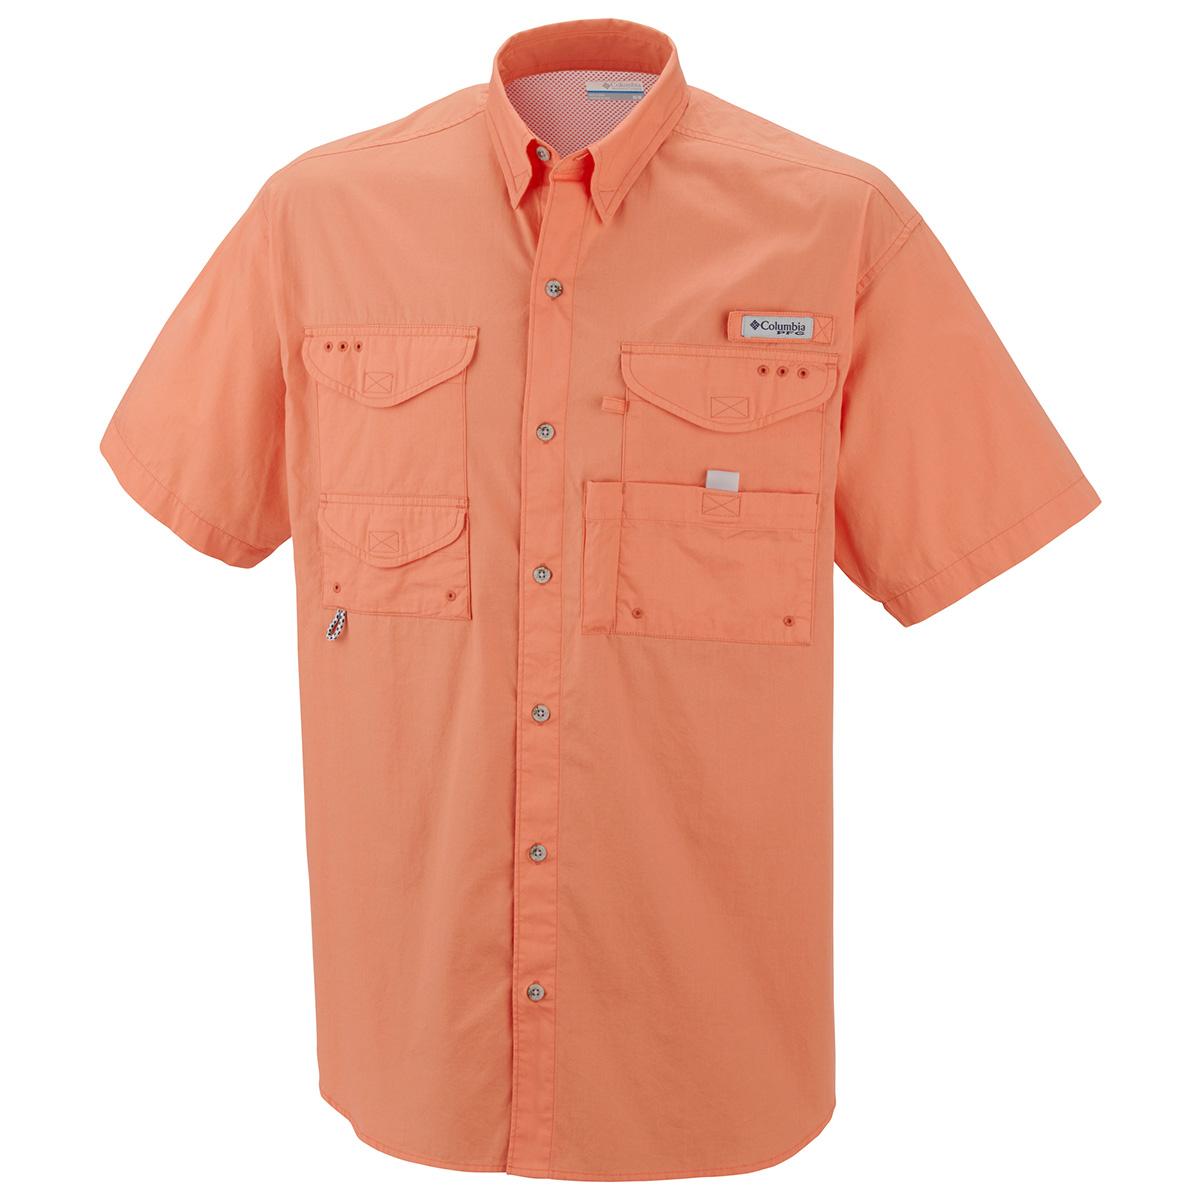 Columbia Bonehead Ss Shirt 2015 Fishing Shirts Ebay